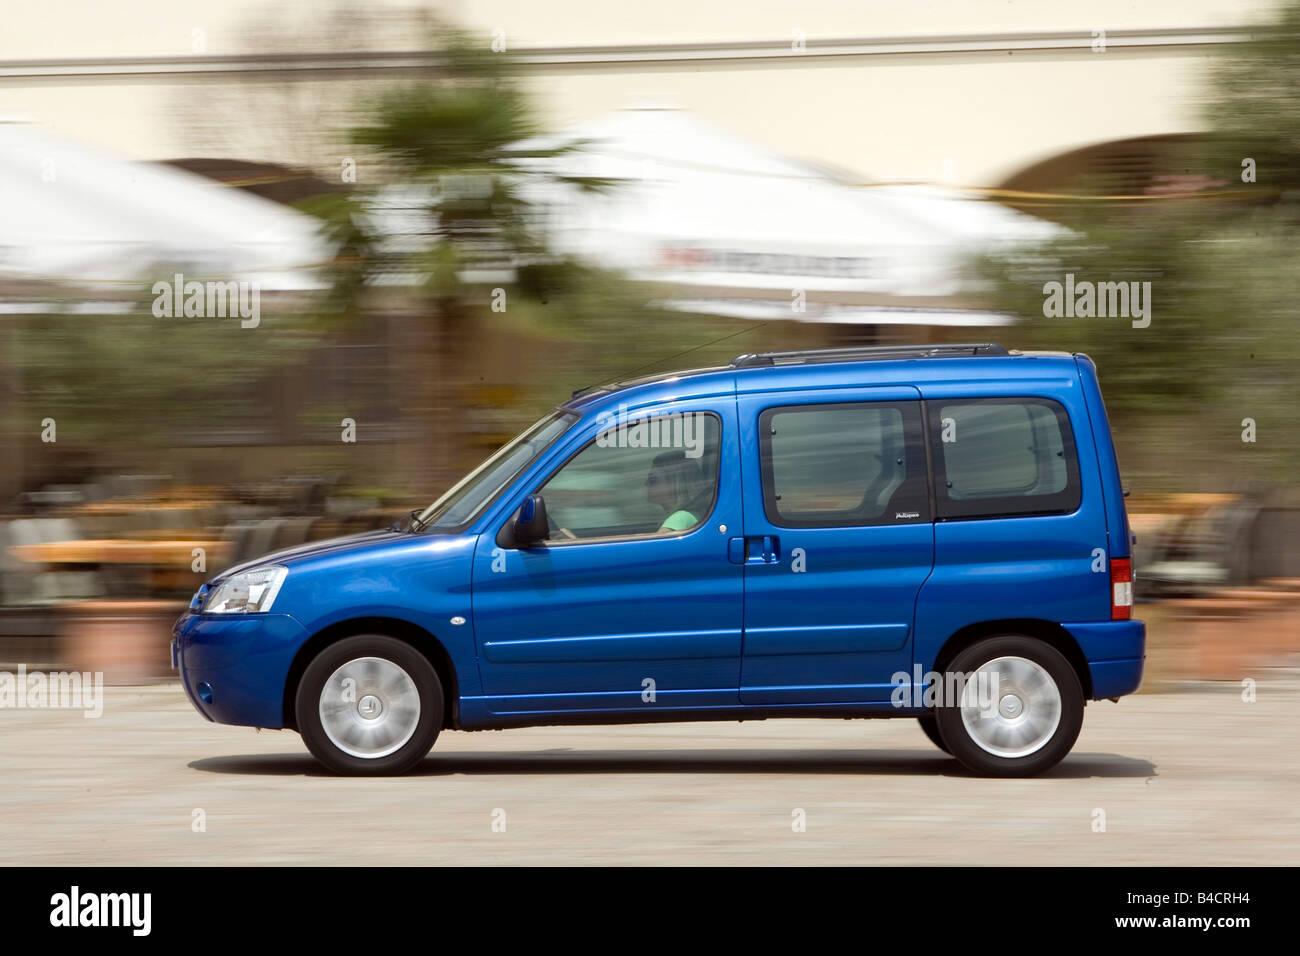 Citroen Berlingo 1 9d Fuse Box Wiring Diagram Libraries Peugeot Partner Van Librarycitroen